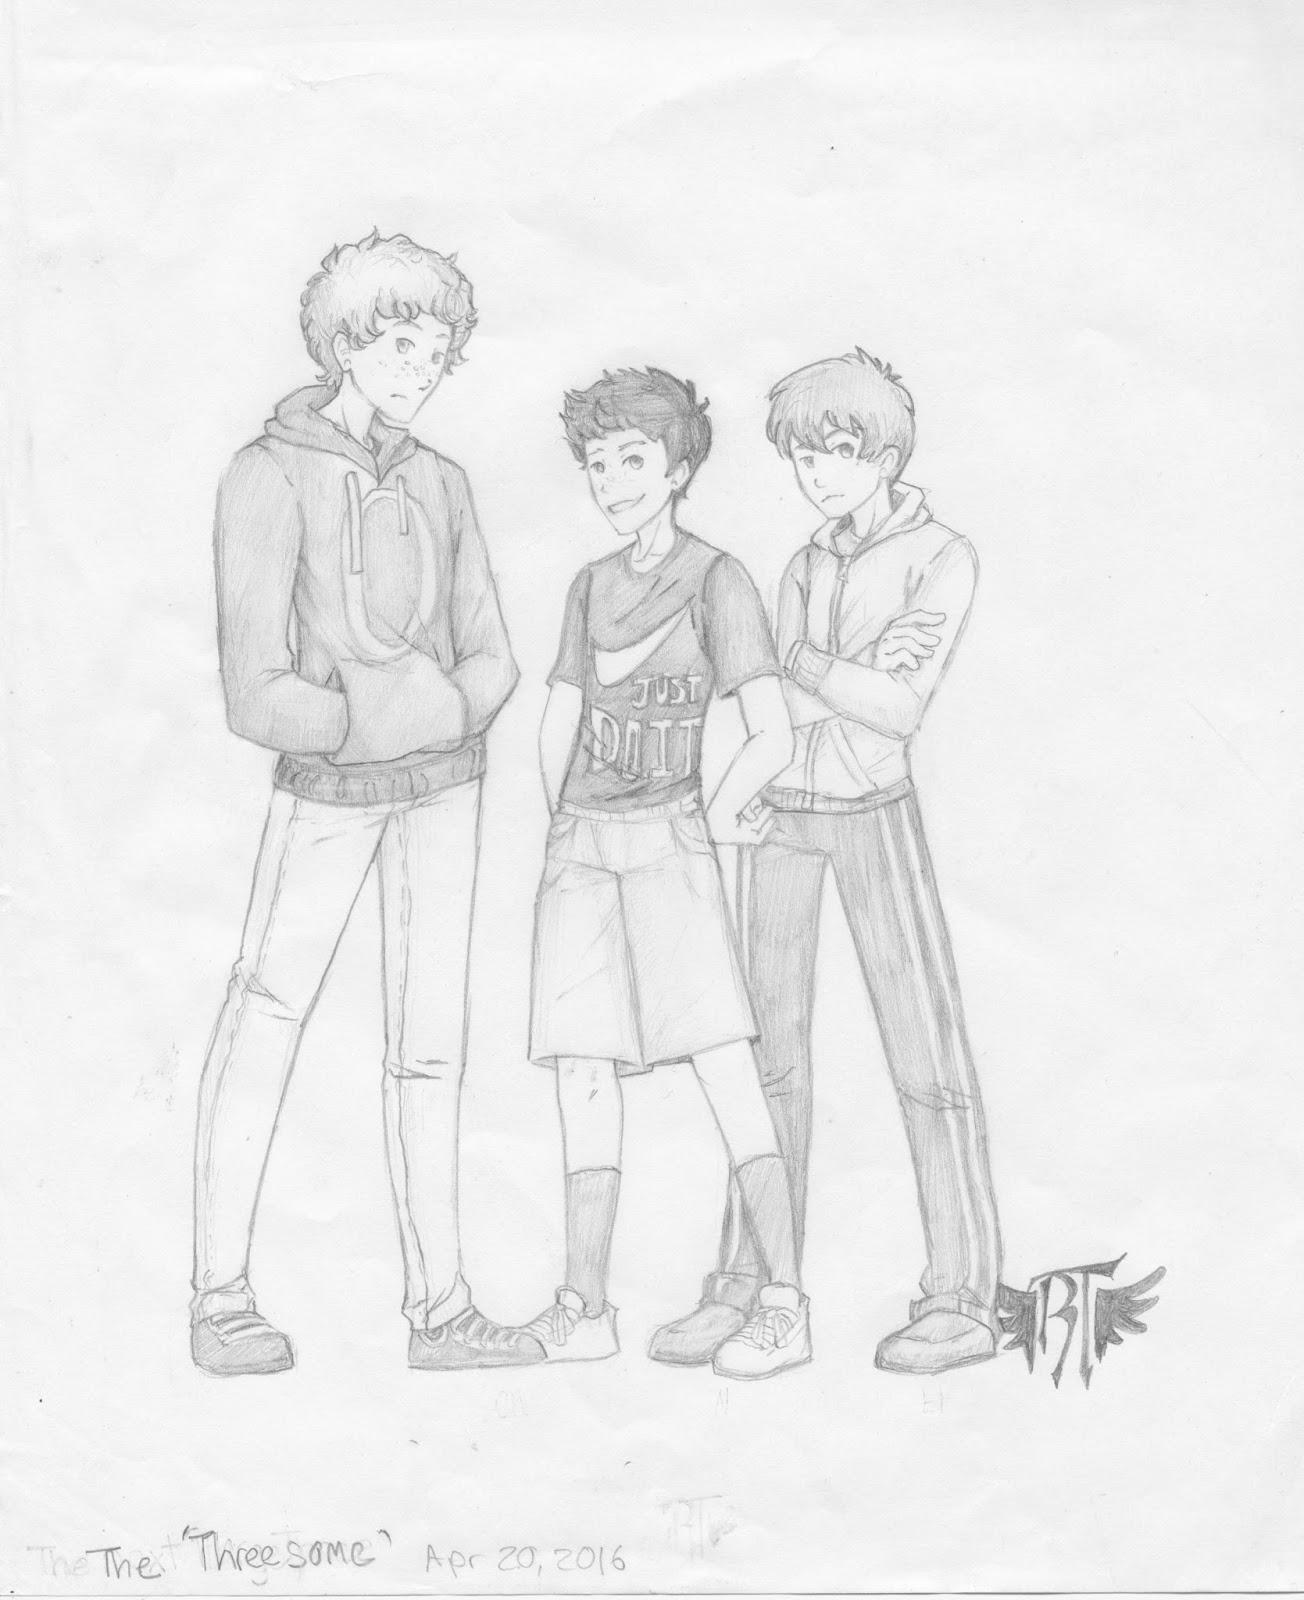 1304x1600 Manga Interest Manga Guy Sketch Standing Pose